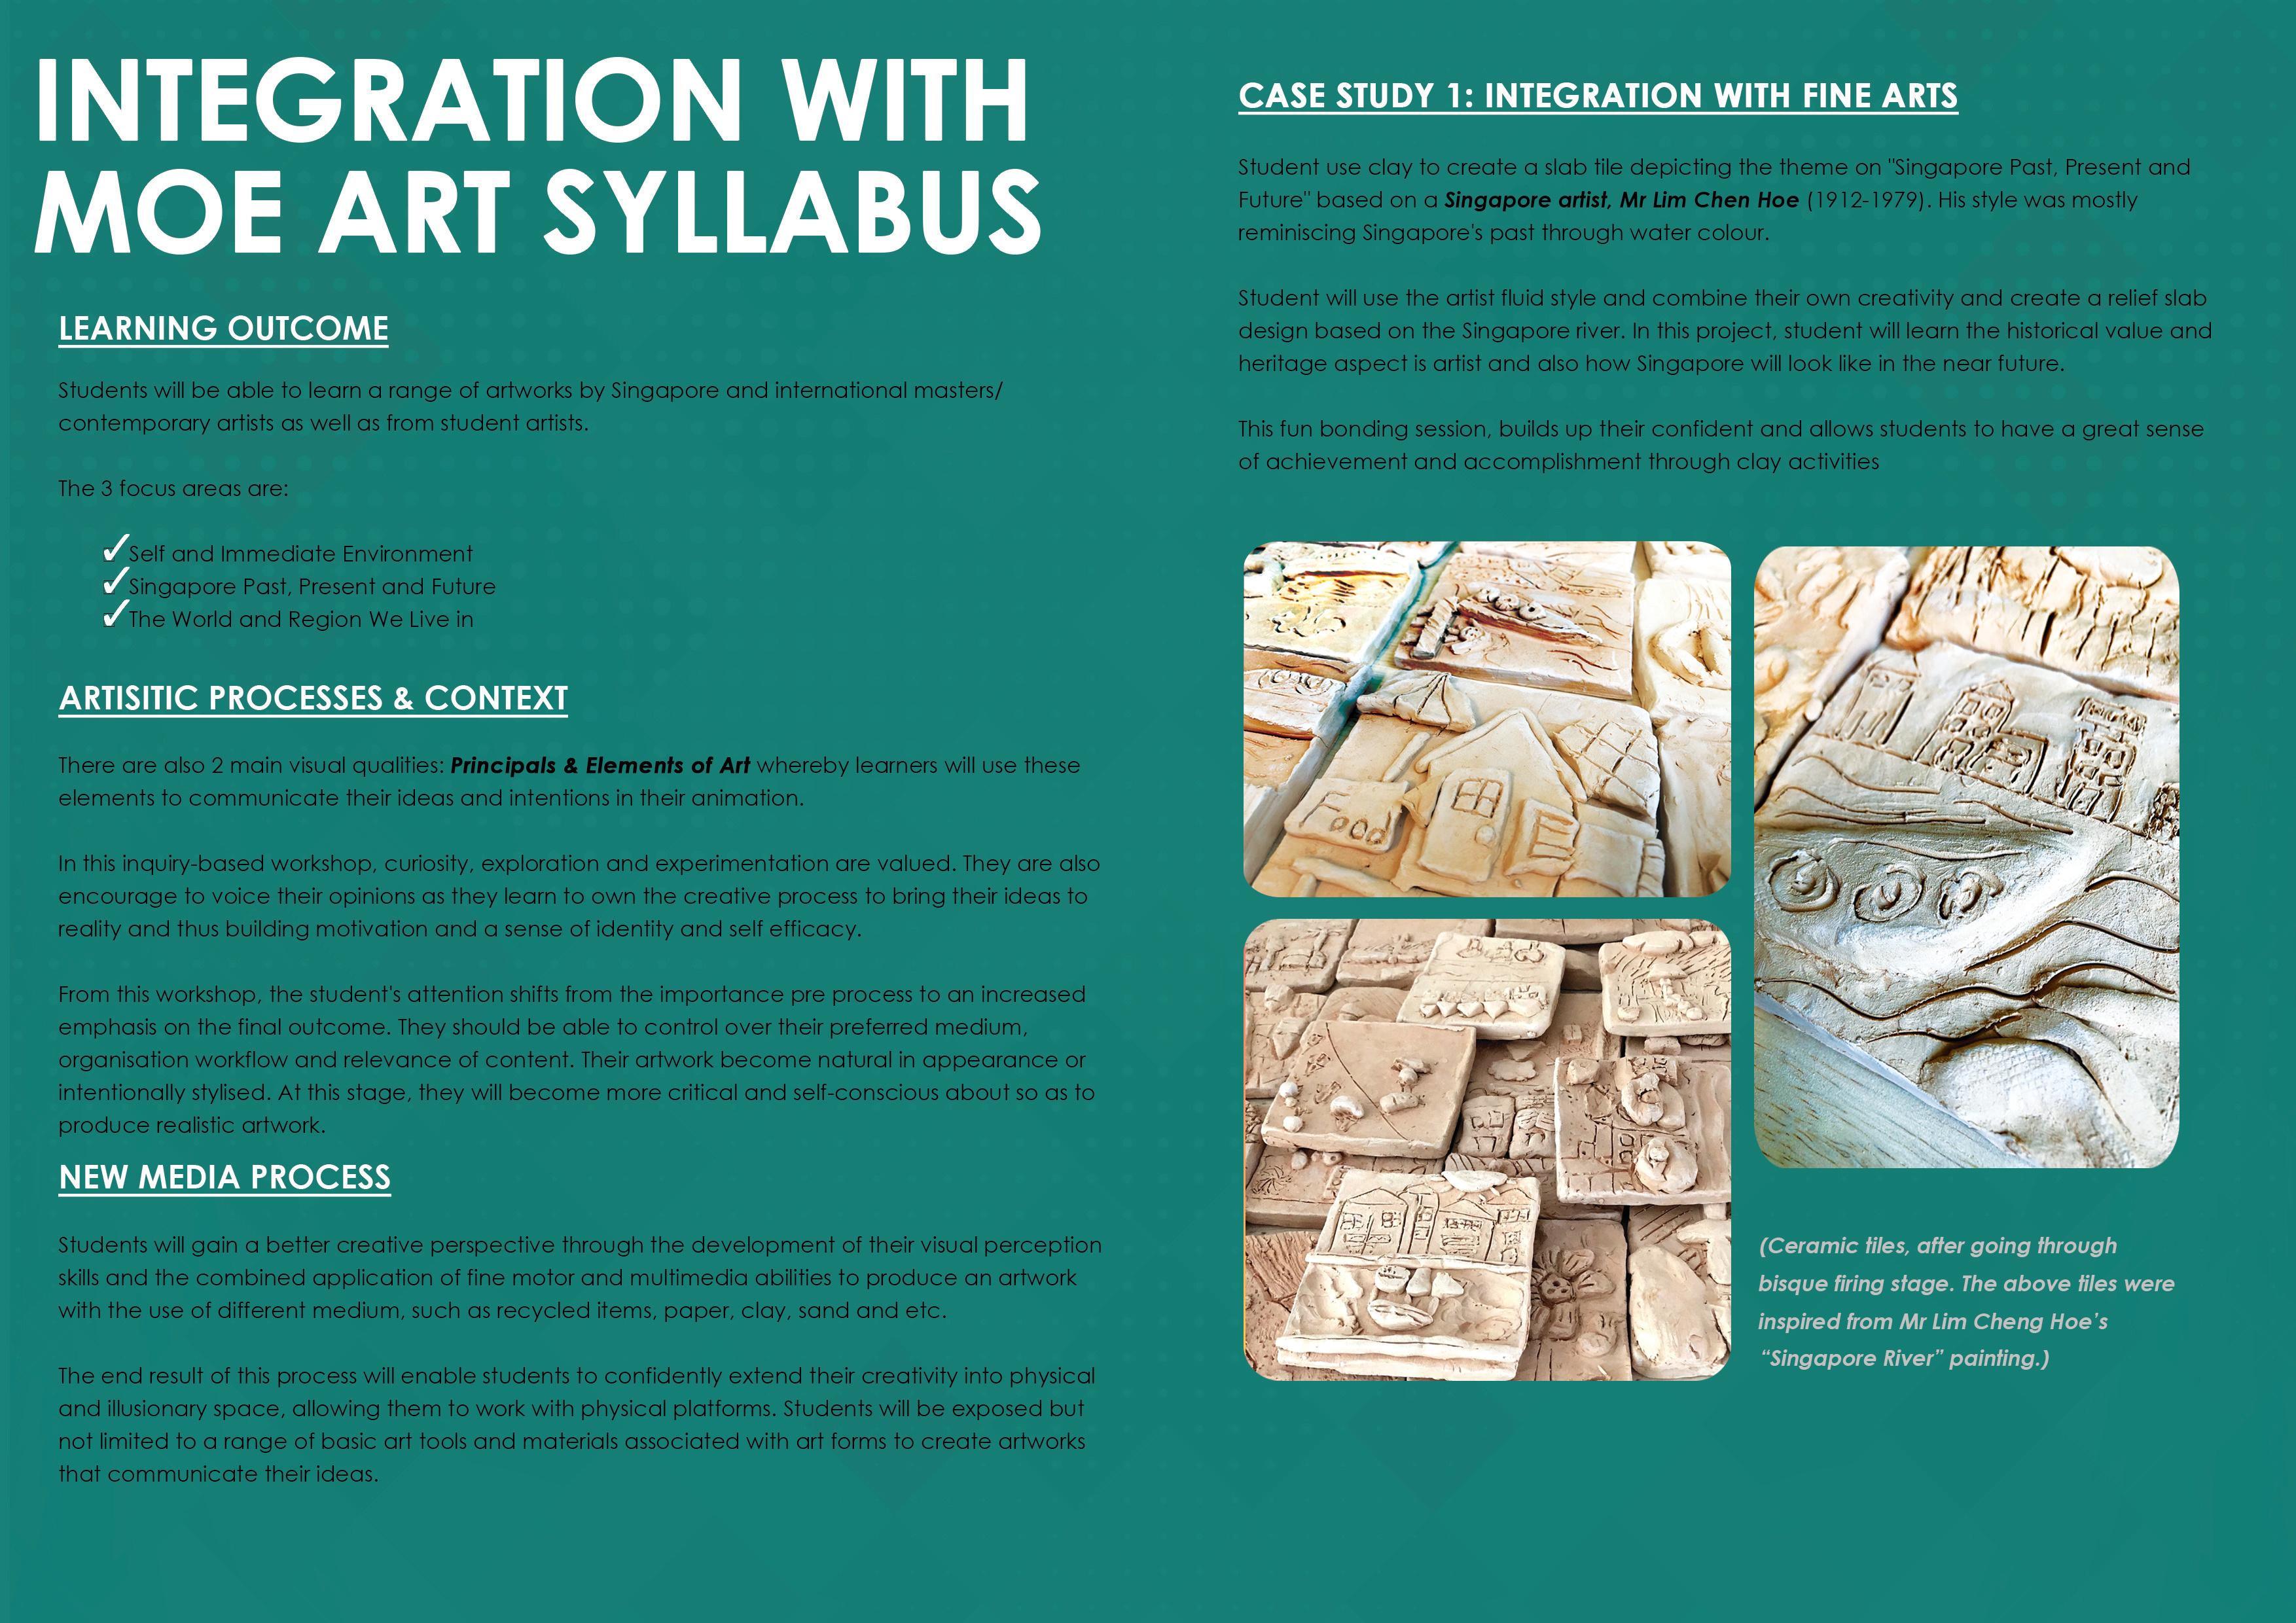 3 Integration with MOE Art Syllabus